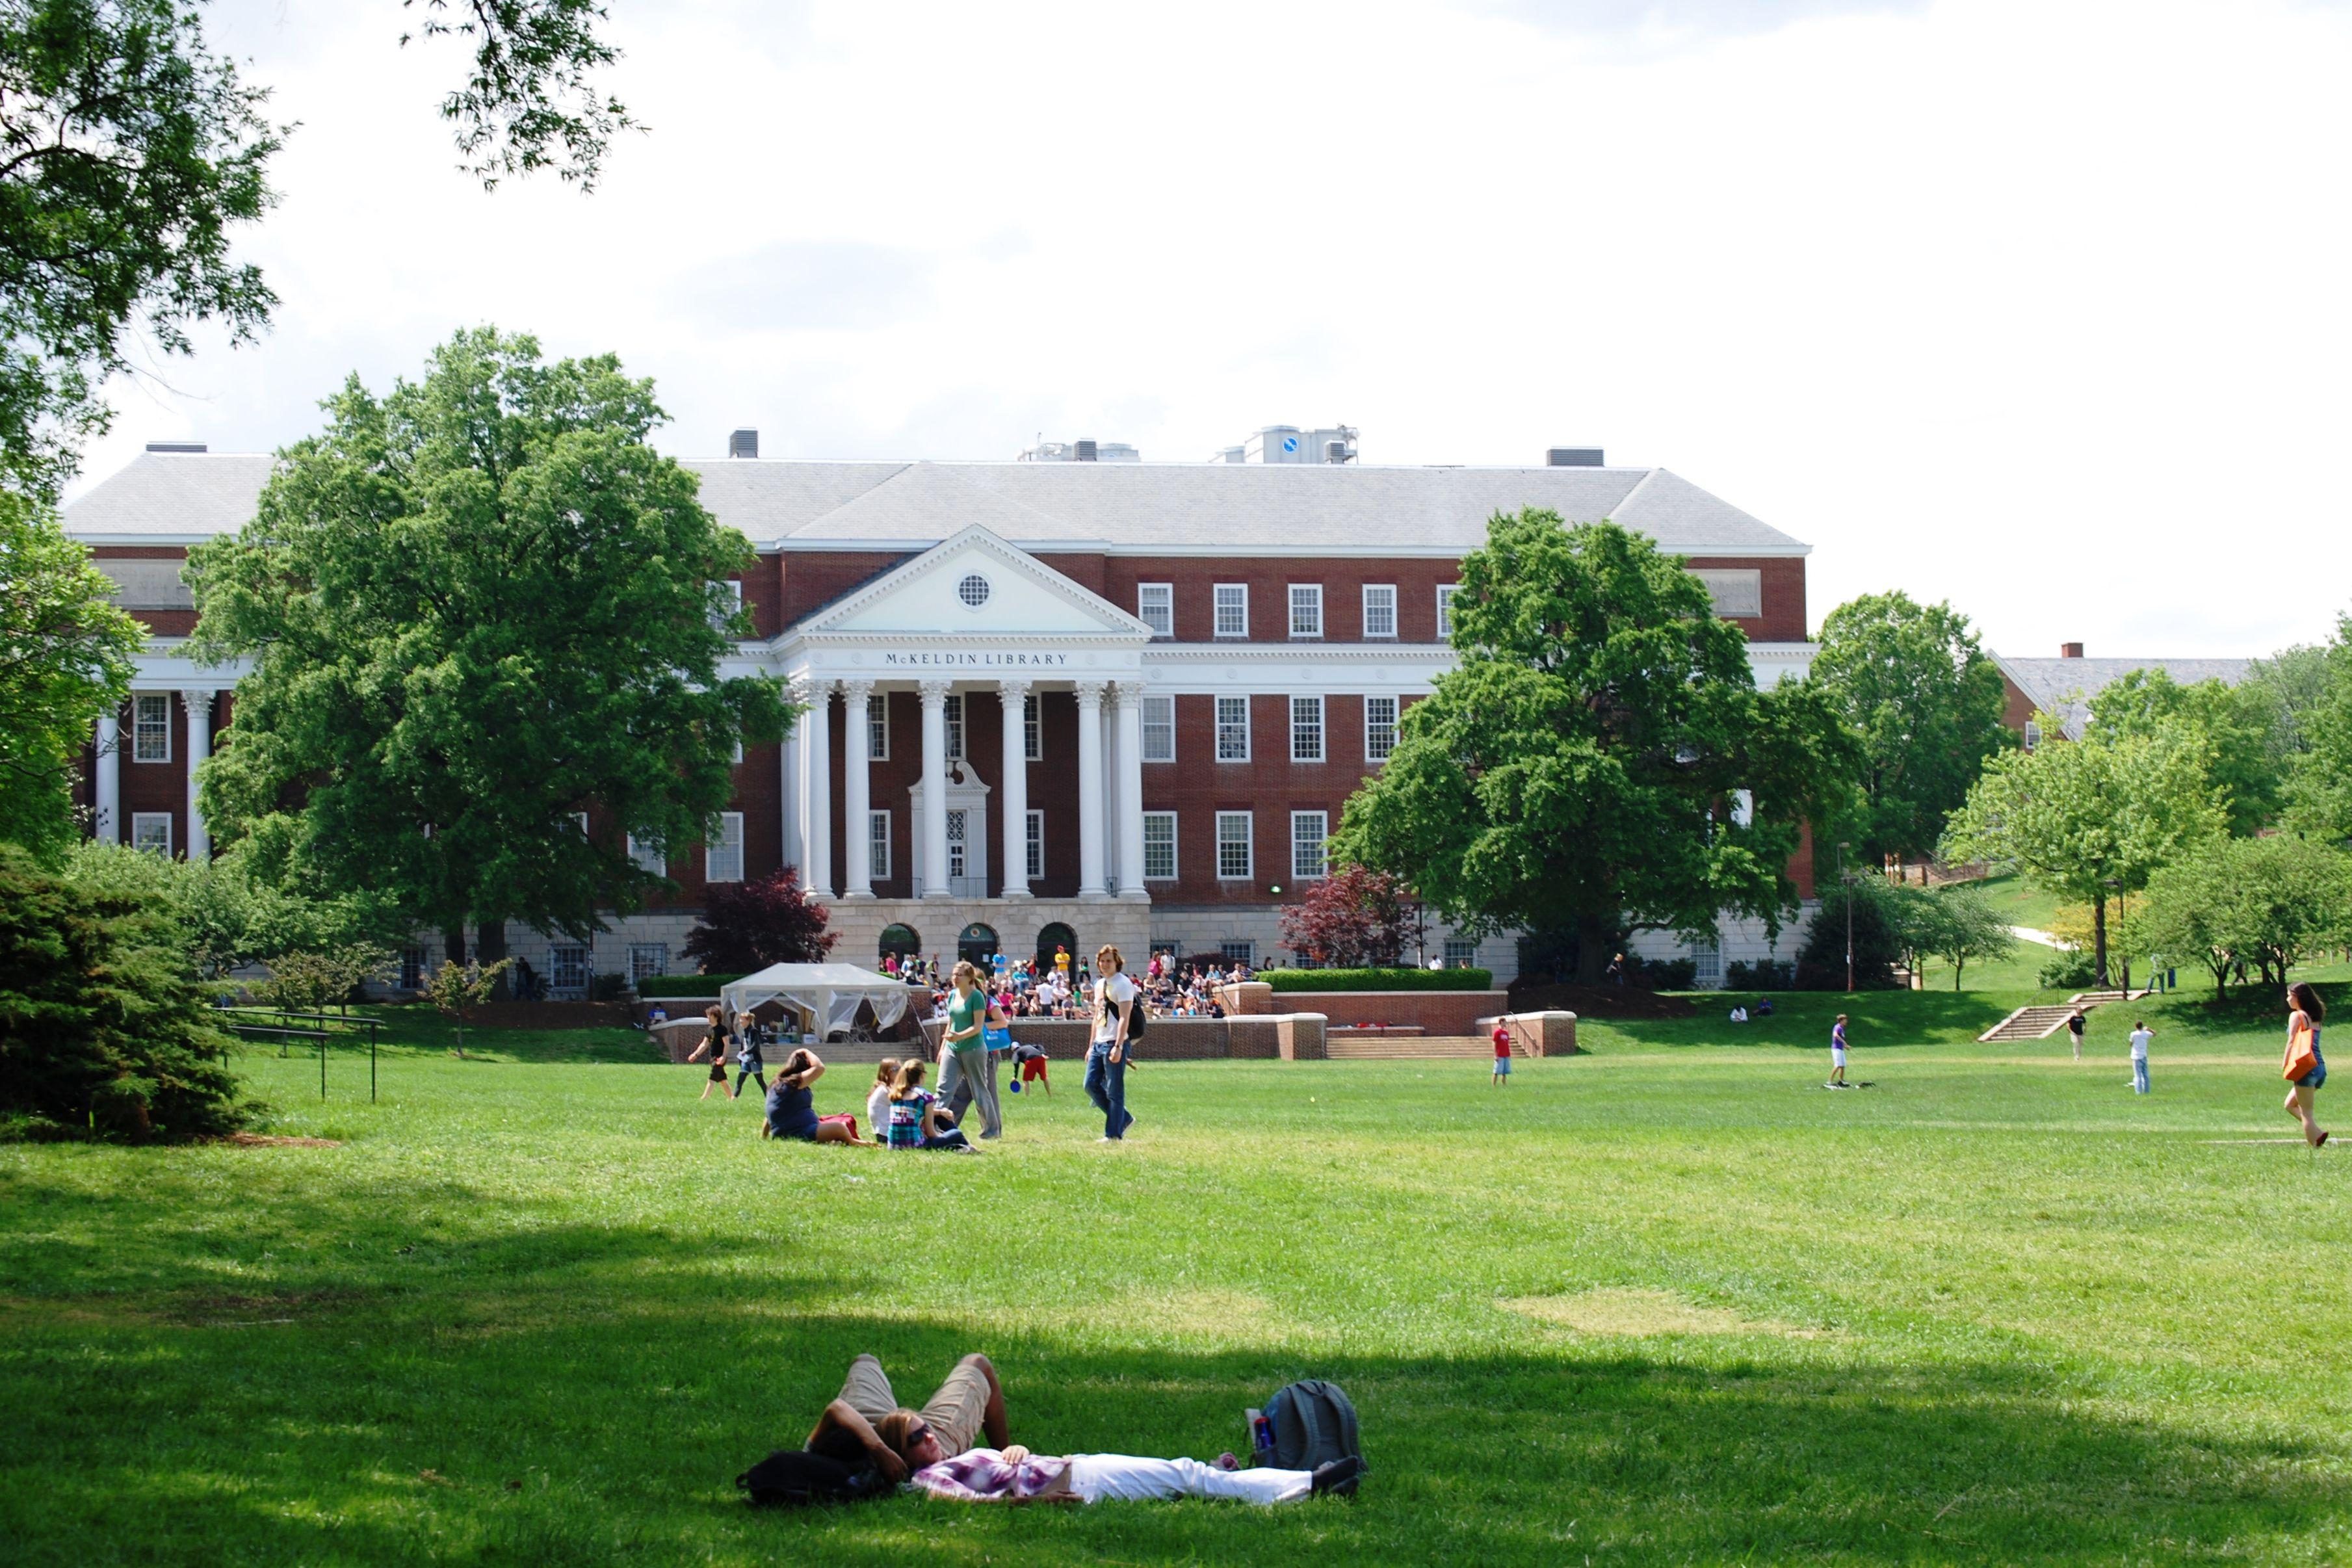 University of Maryland McKeldin Library